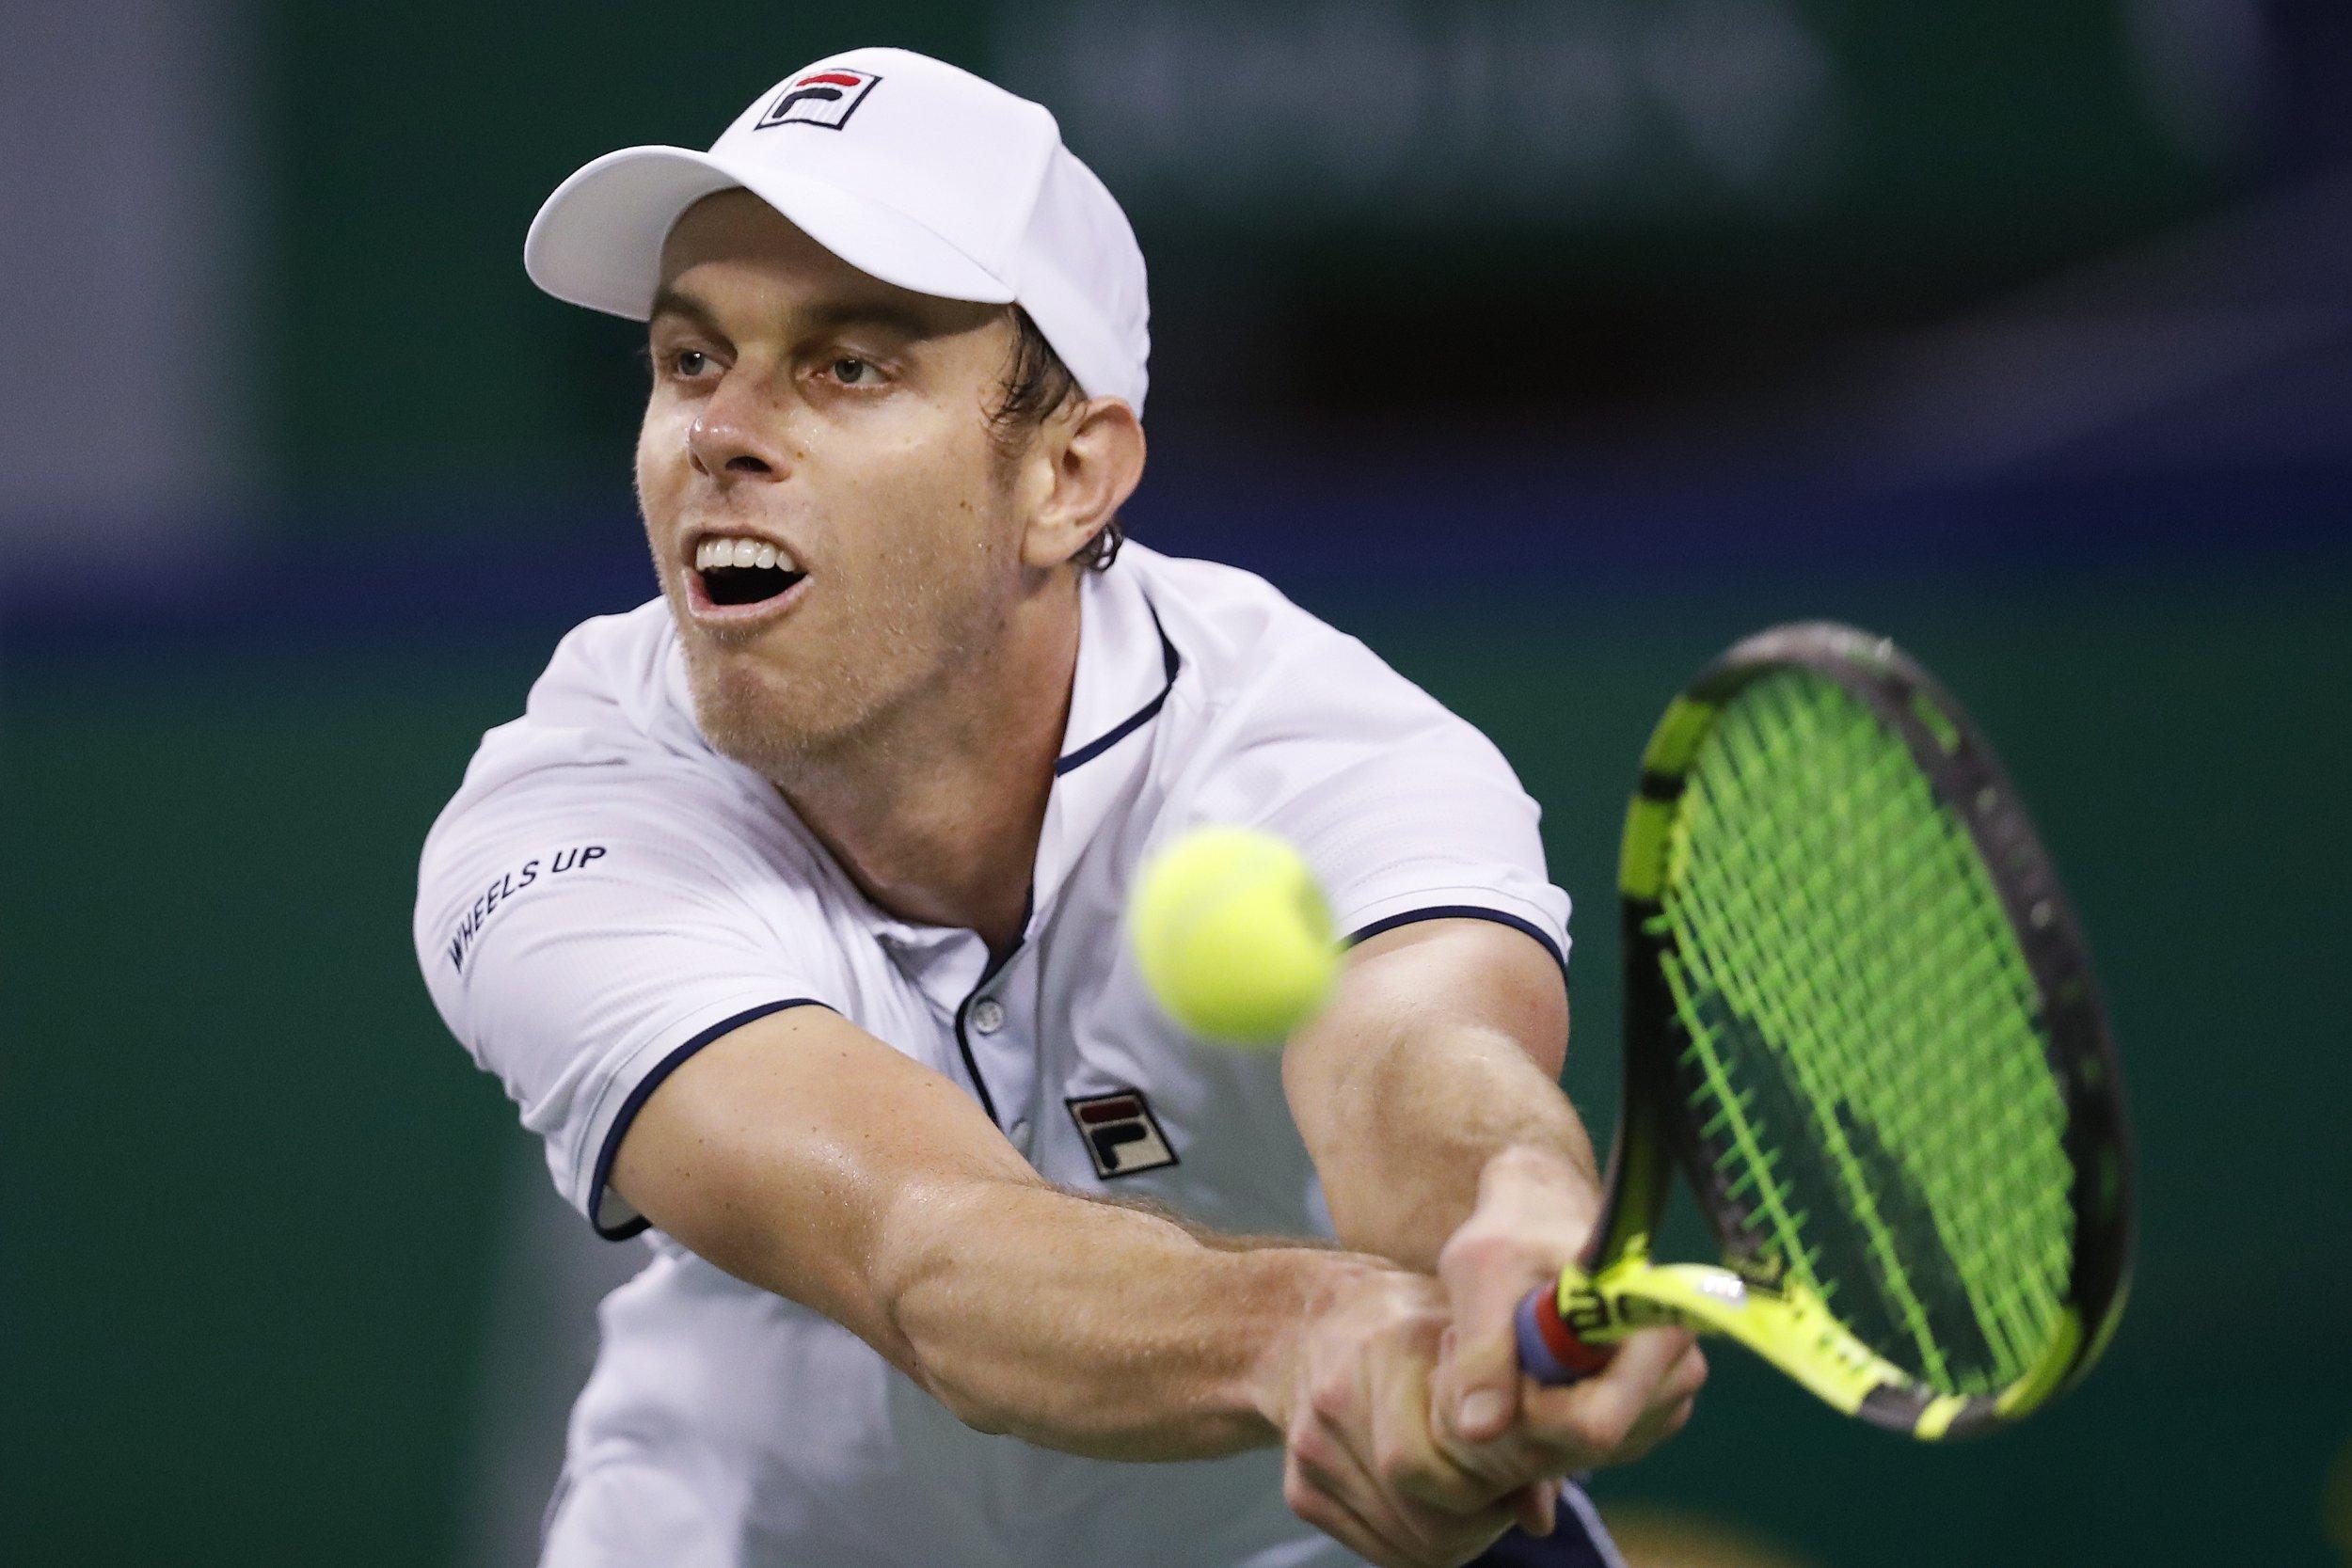 Sam Querrey won't join Roger Federer & Rafael Nadal in London after shock Paris Masters exit